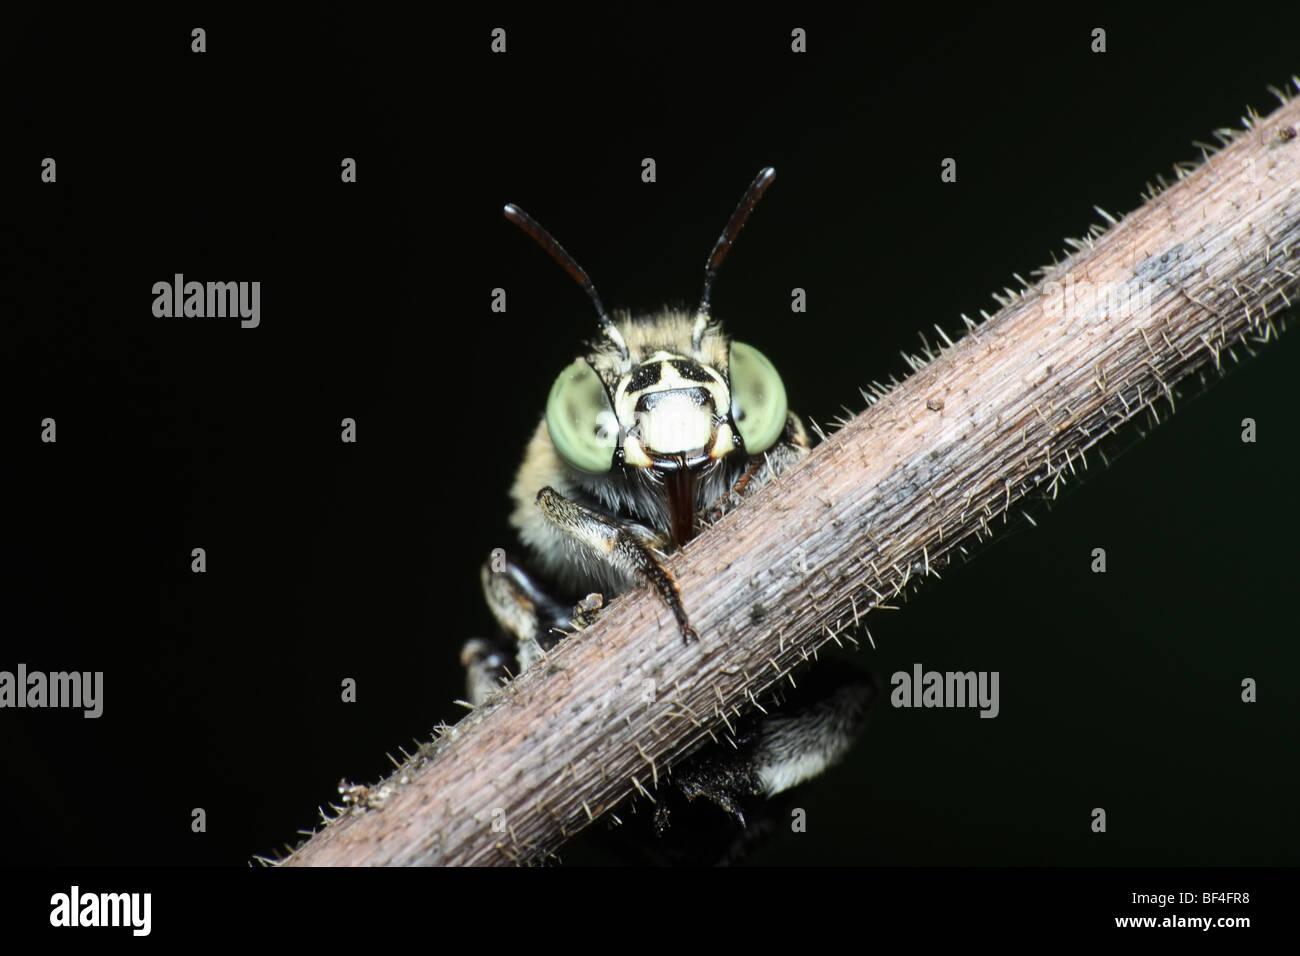 Australian Native Bee - Stock Image